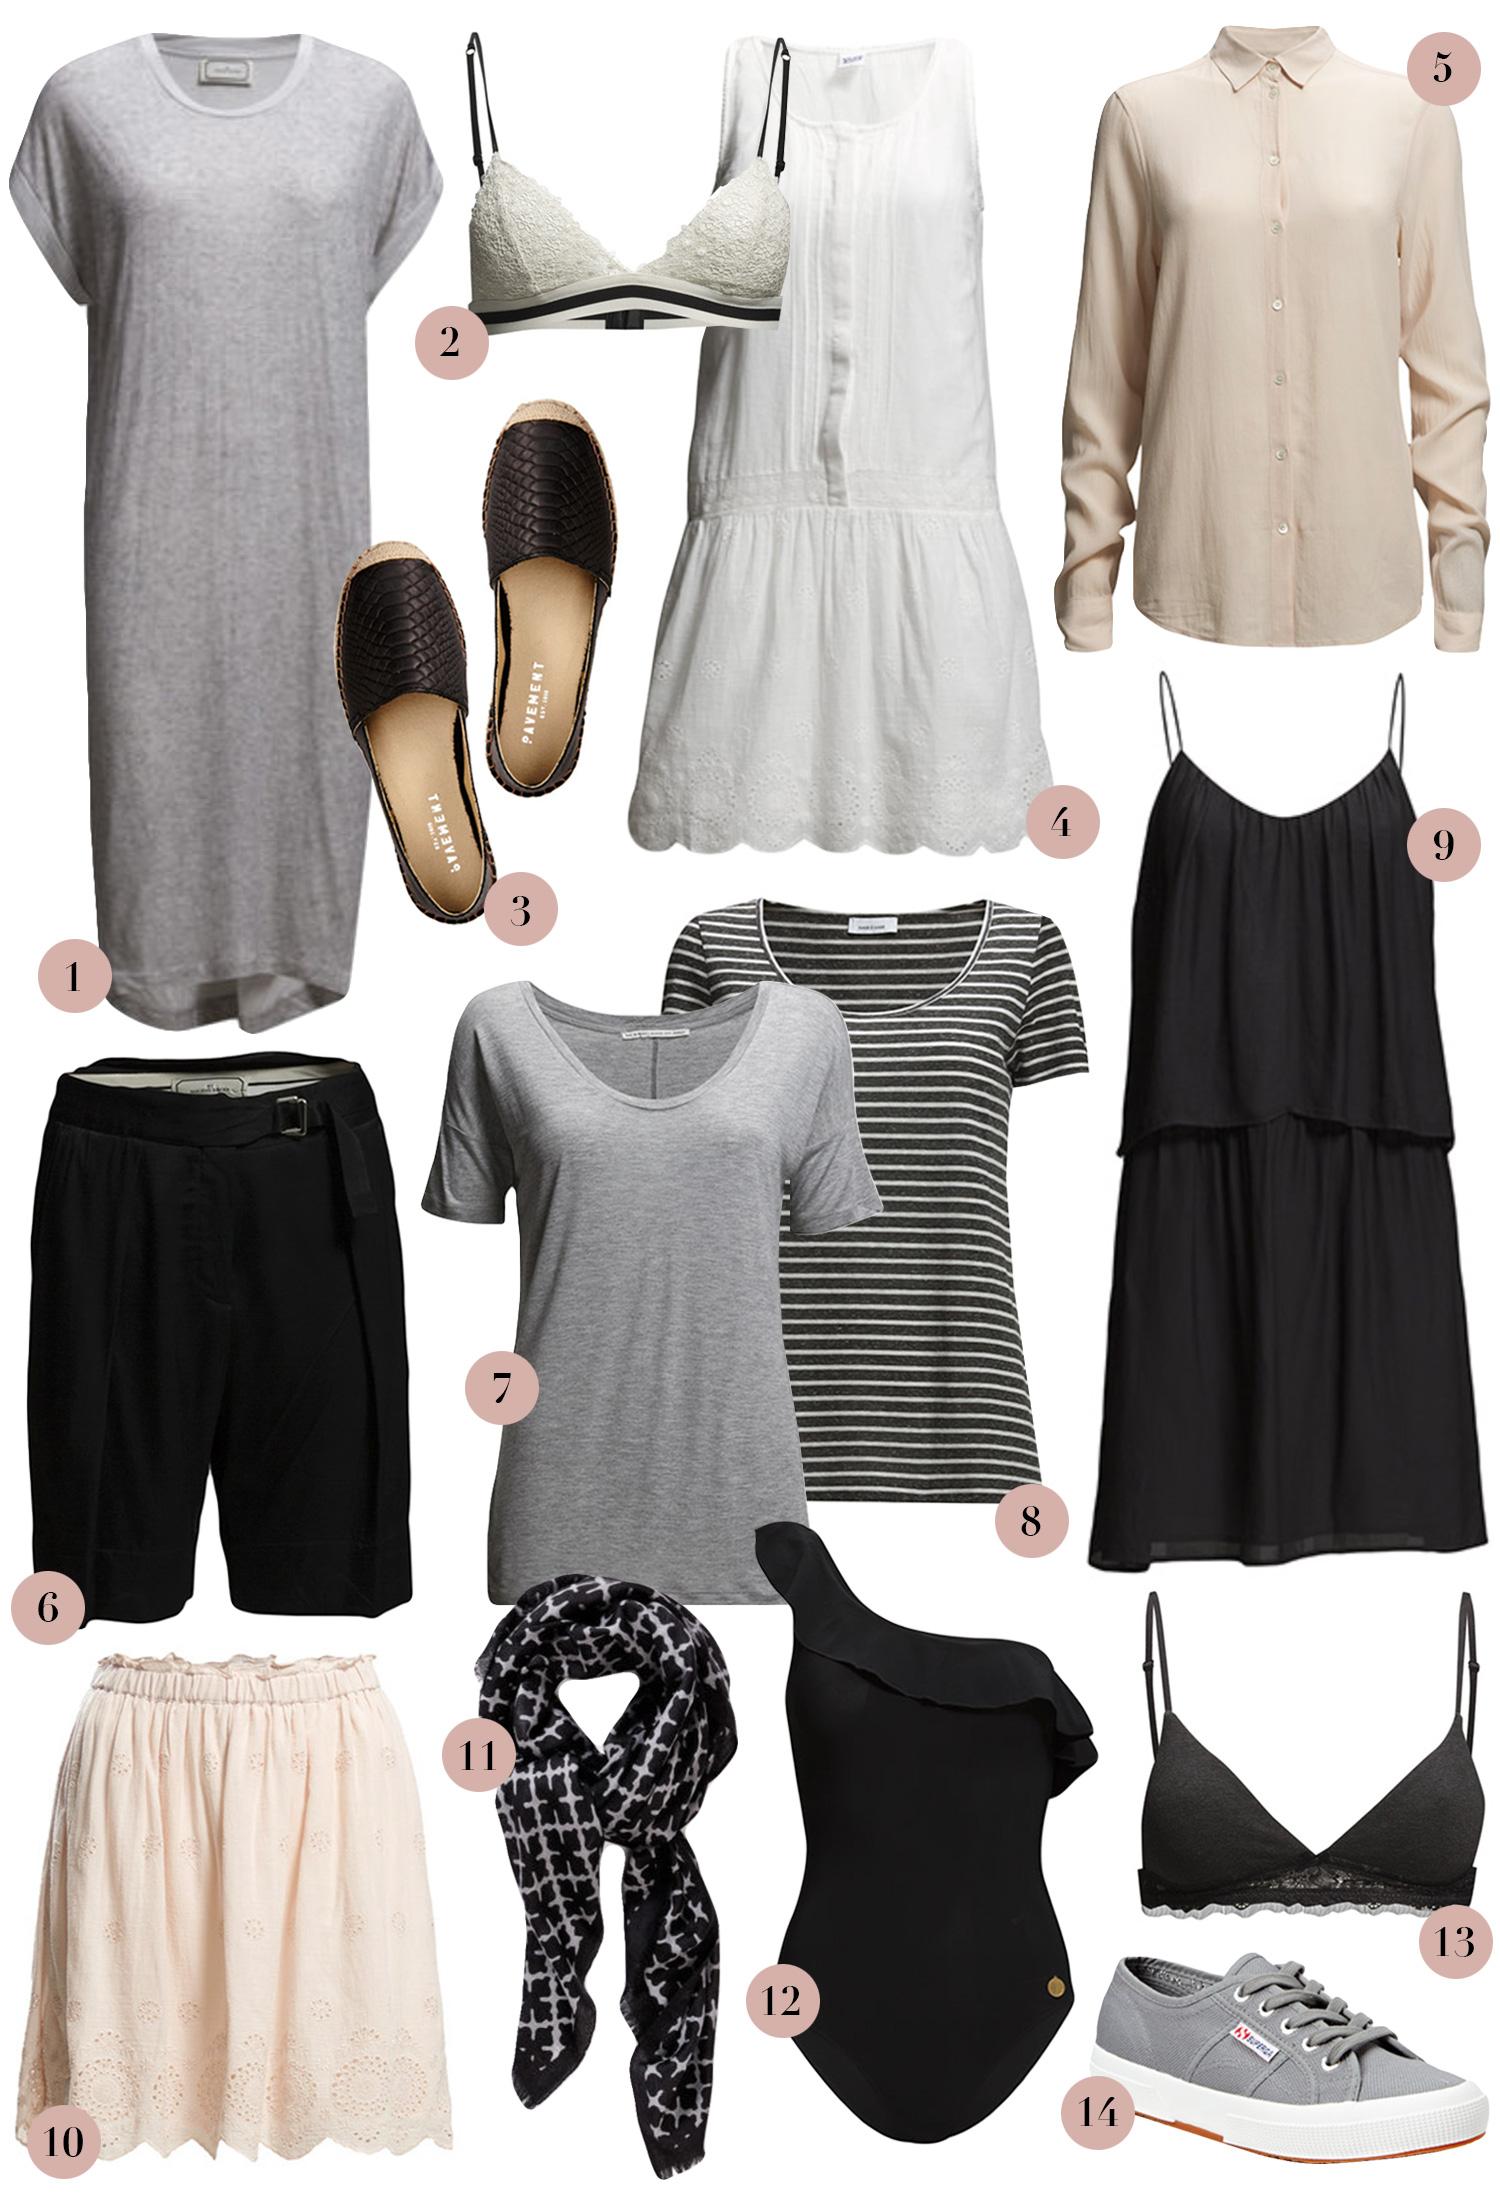 boozt-tøj-online-shopping-sommertøj-modeblog-@2x